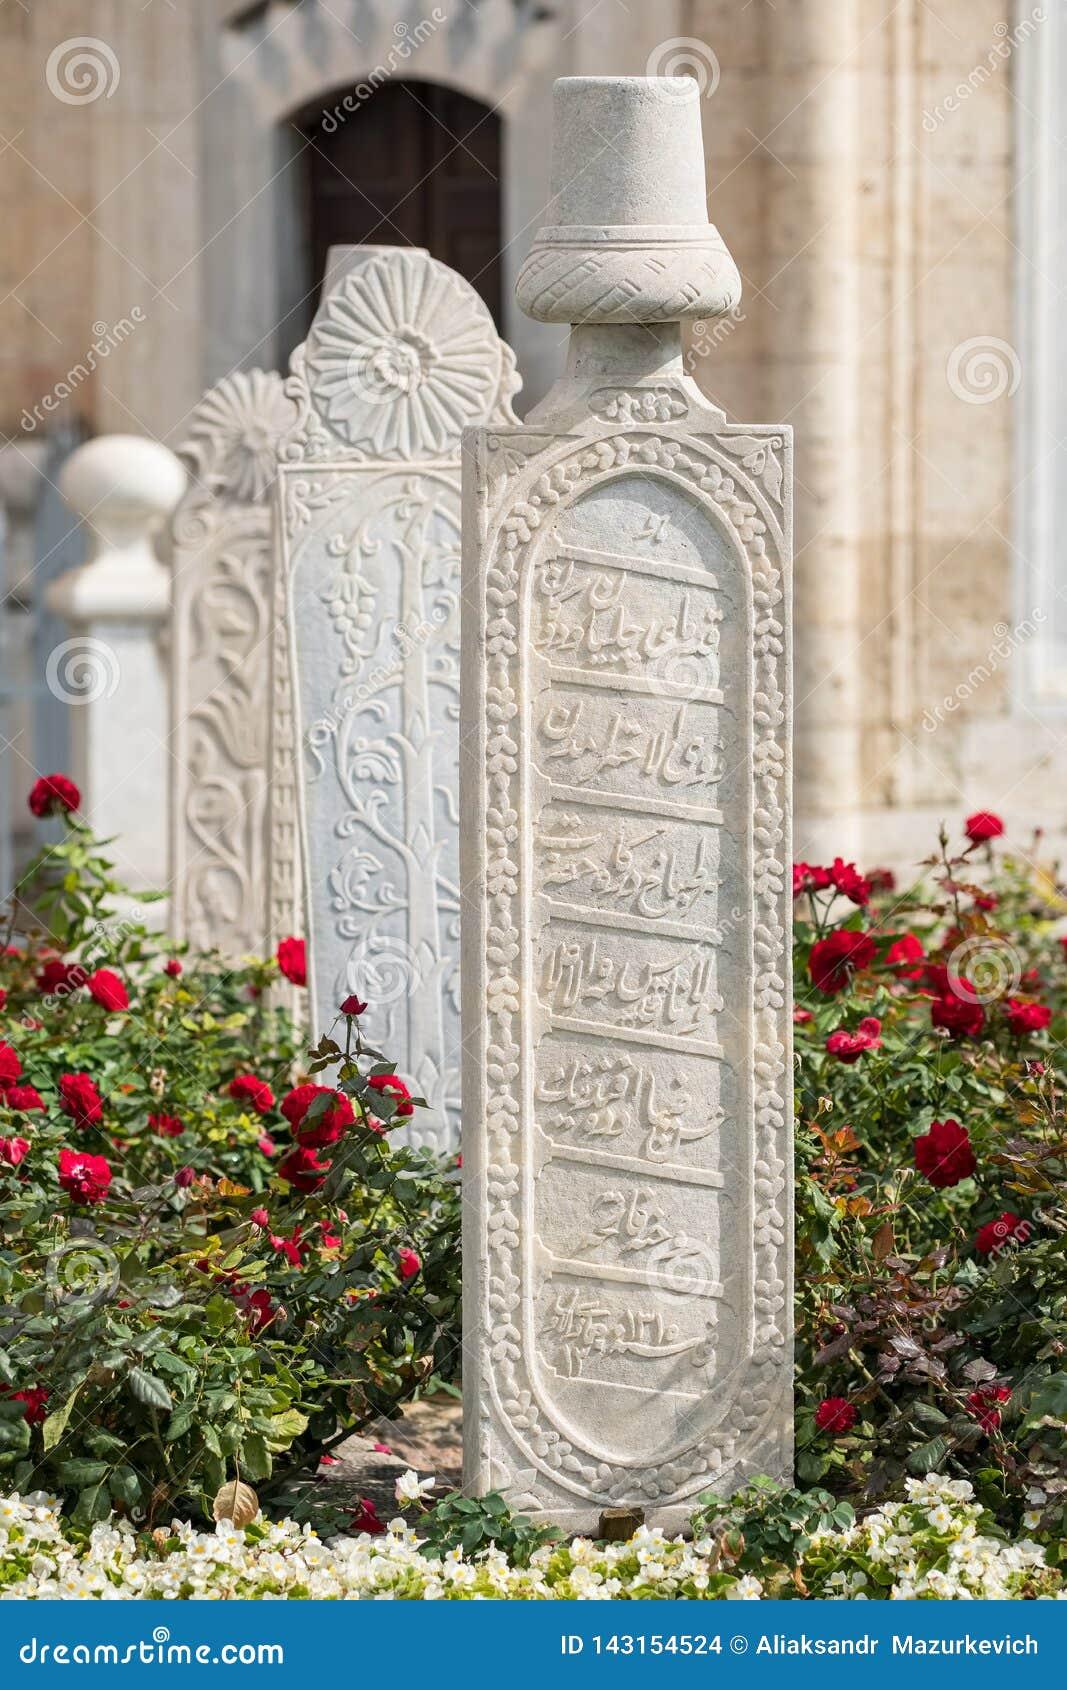 Ottoman and Seljuk period tomb stones, Mevlana museum garden Konya, Turkey